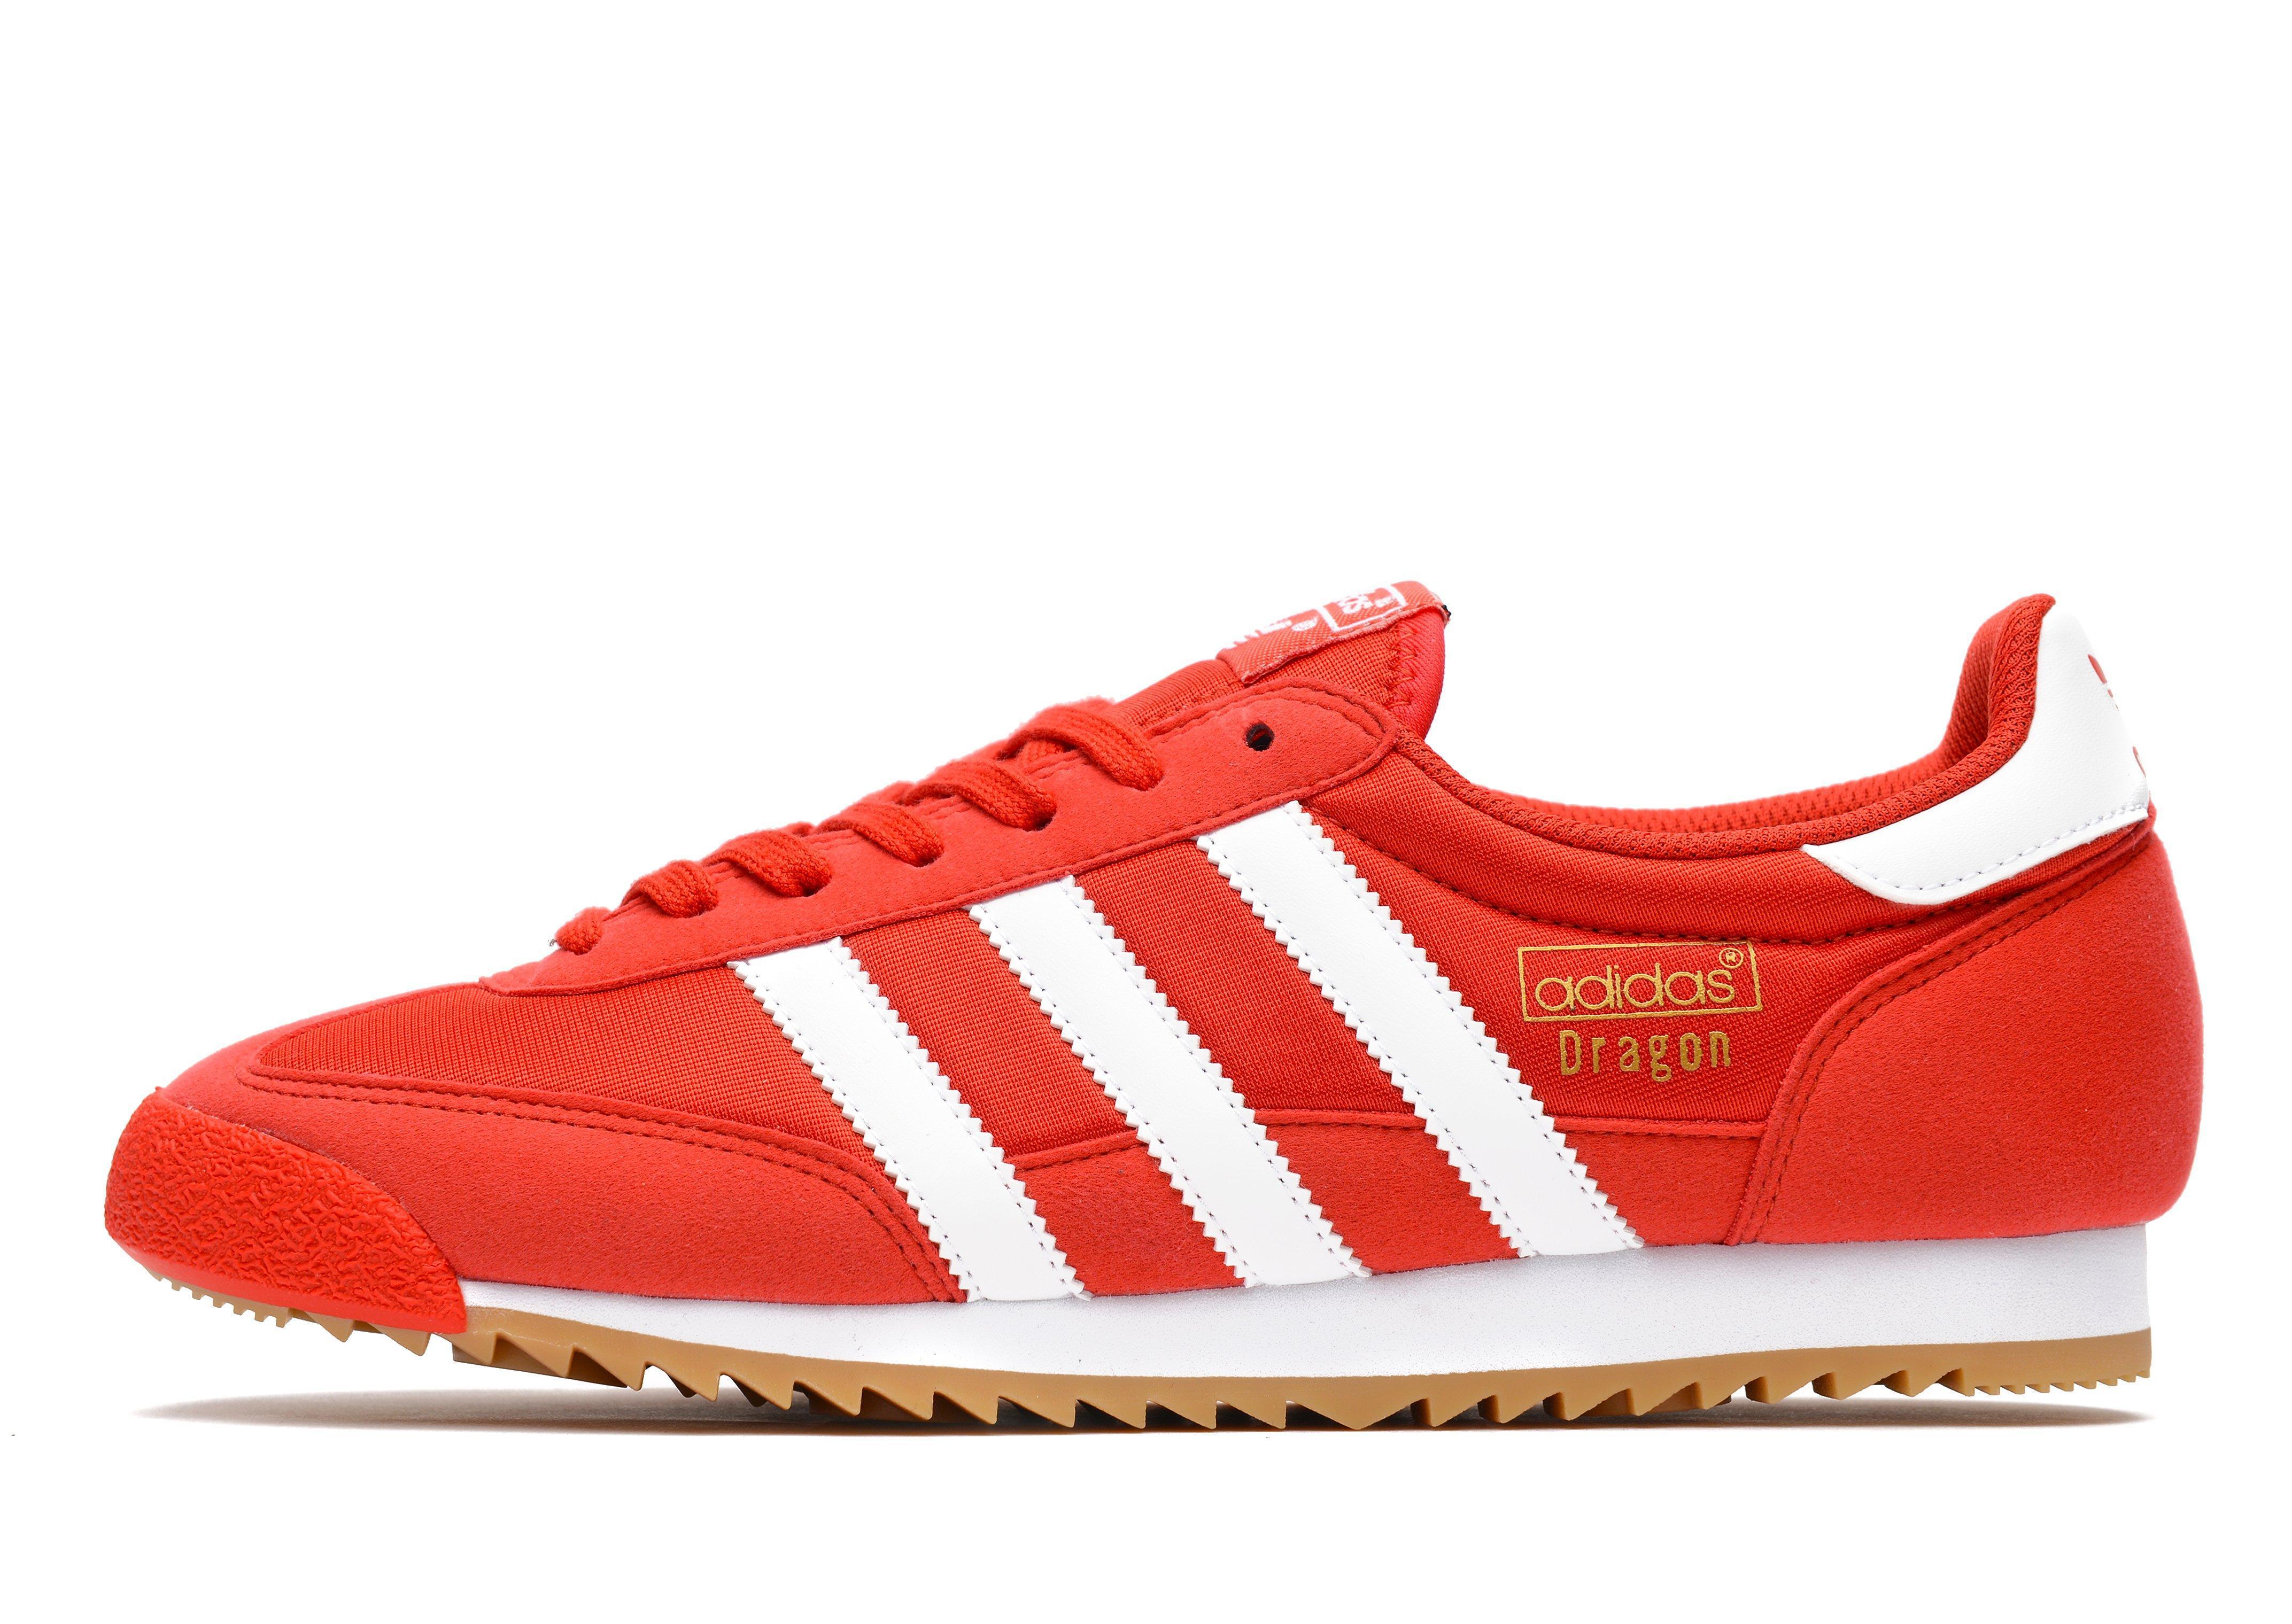 adidas dragons red